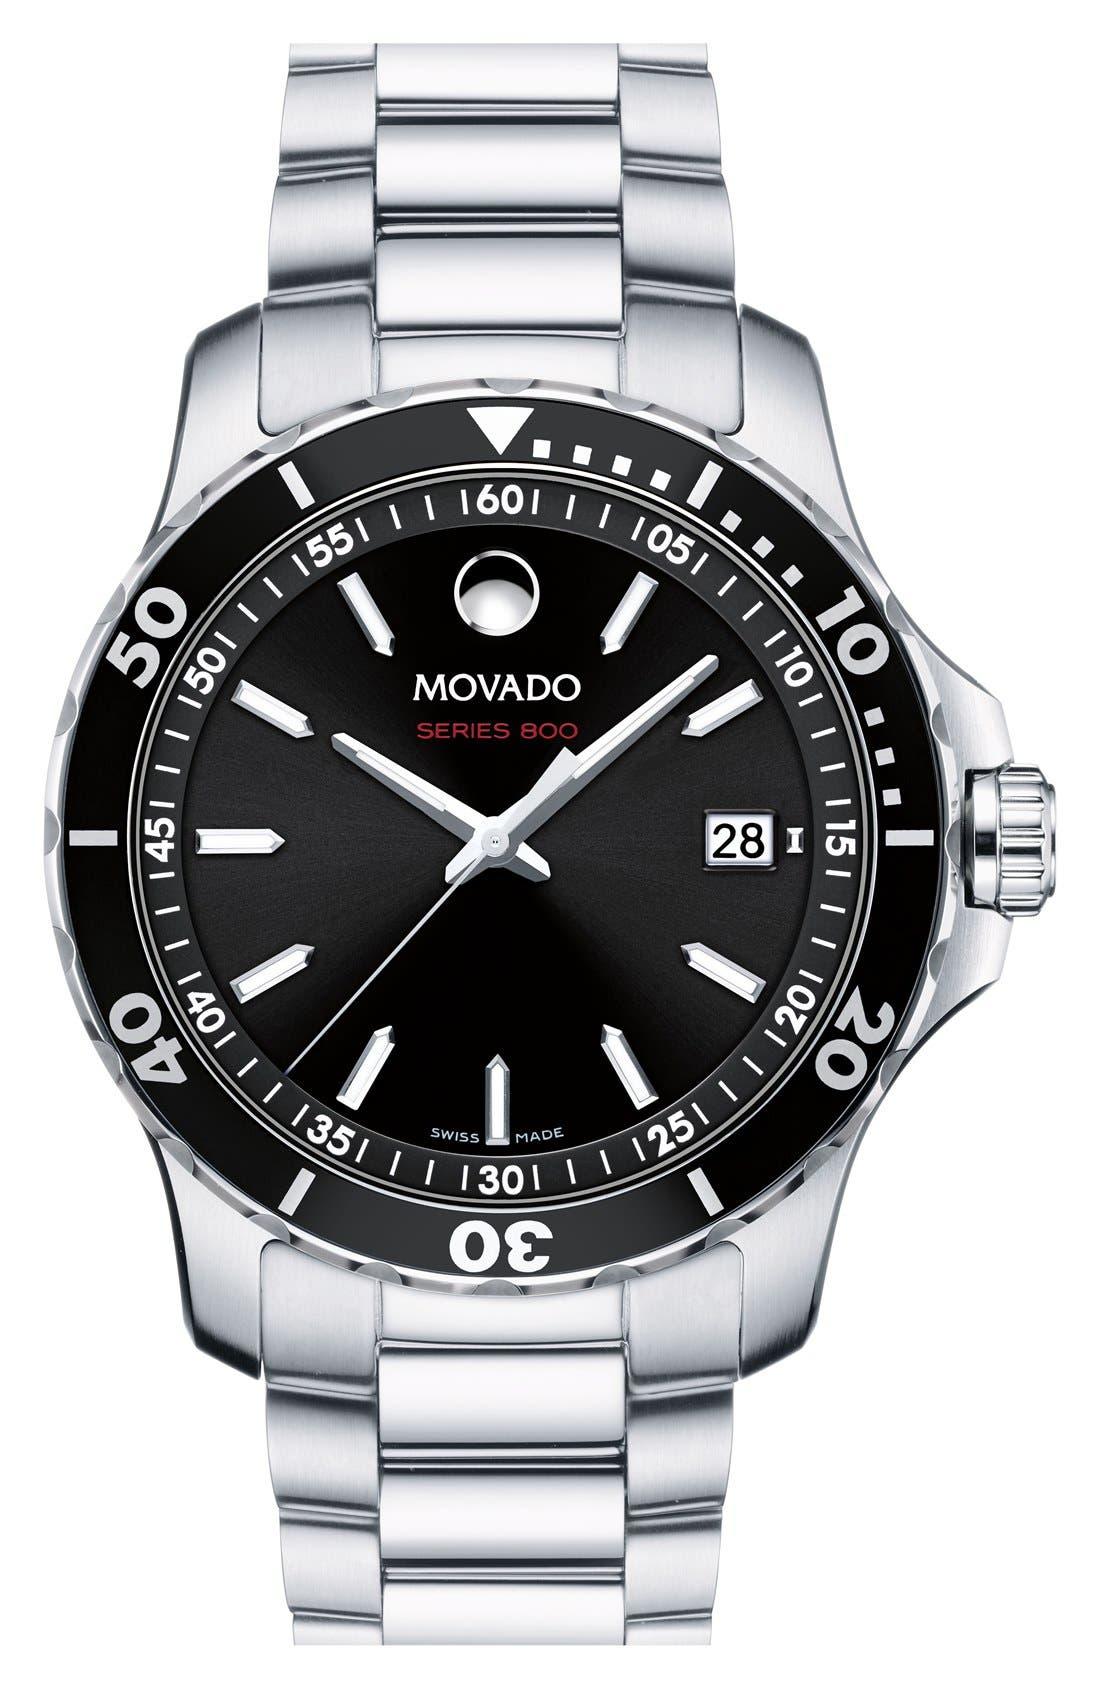 Alternate Image 1 Selected - Movado 'Series 800' Bracelet Watch, 40mm